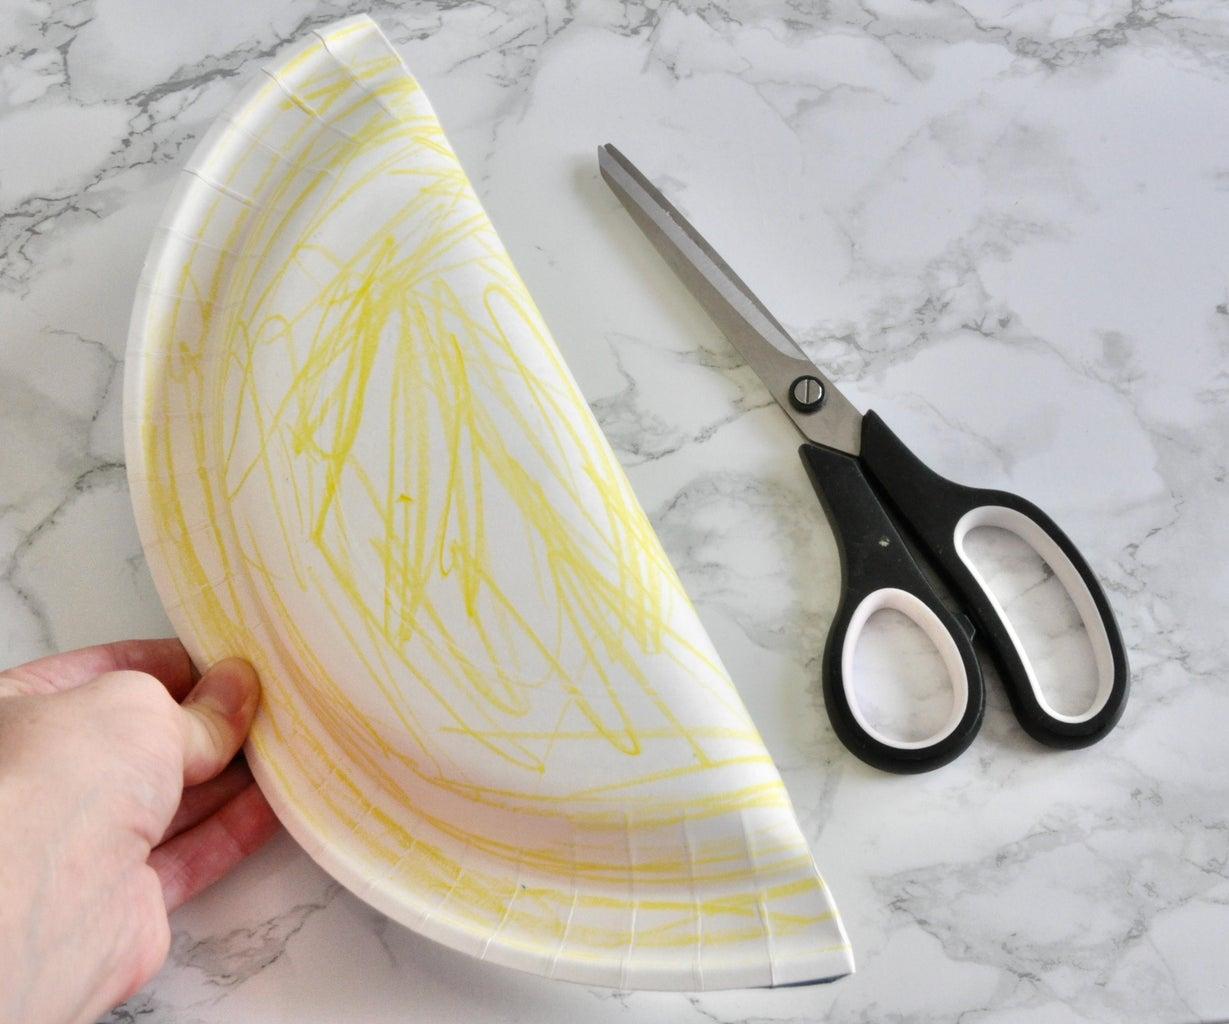 Folding and Cutting